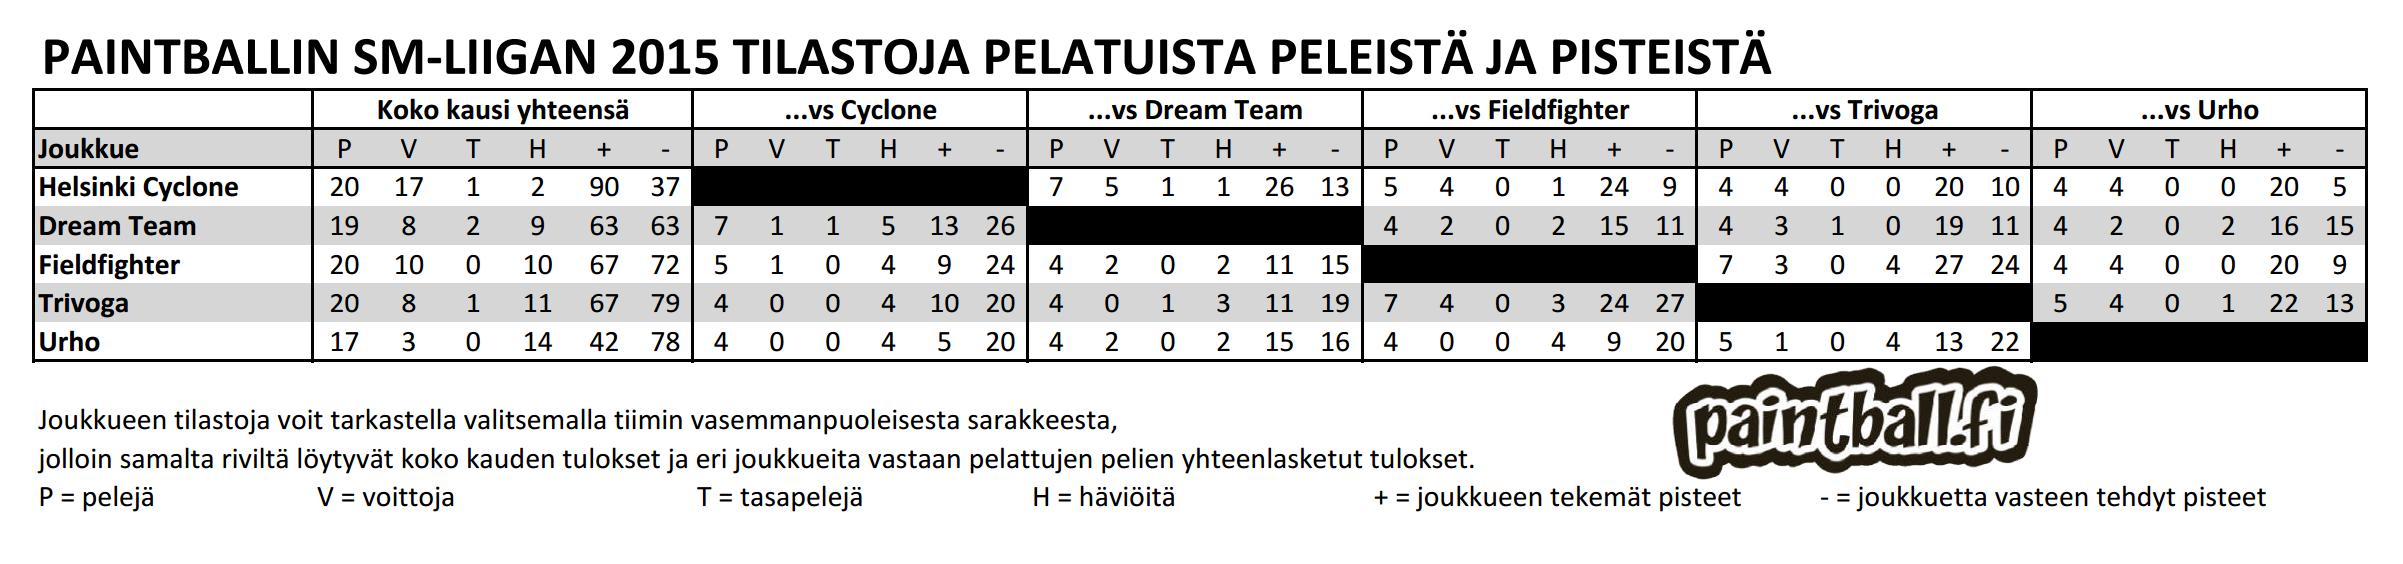 2015_smliiga_tilastot.PNG